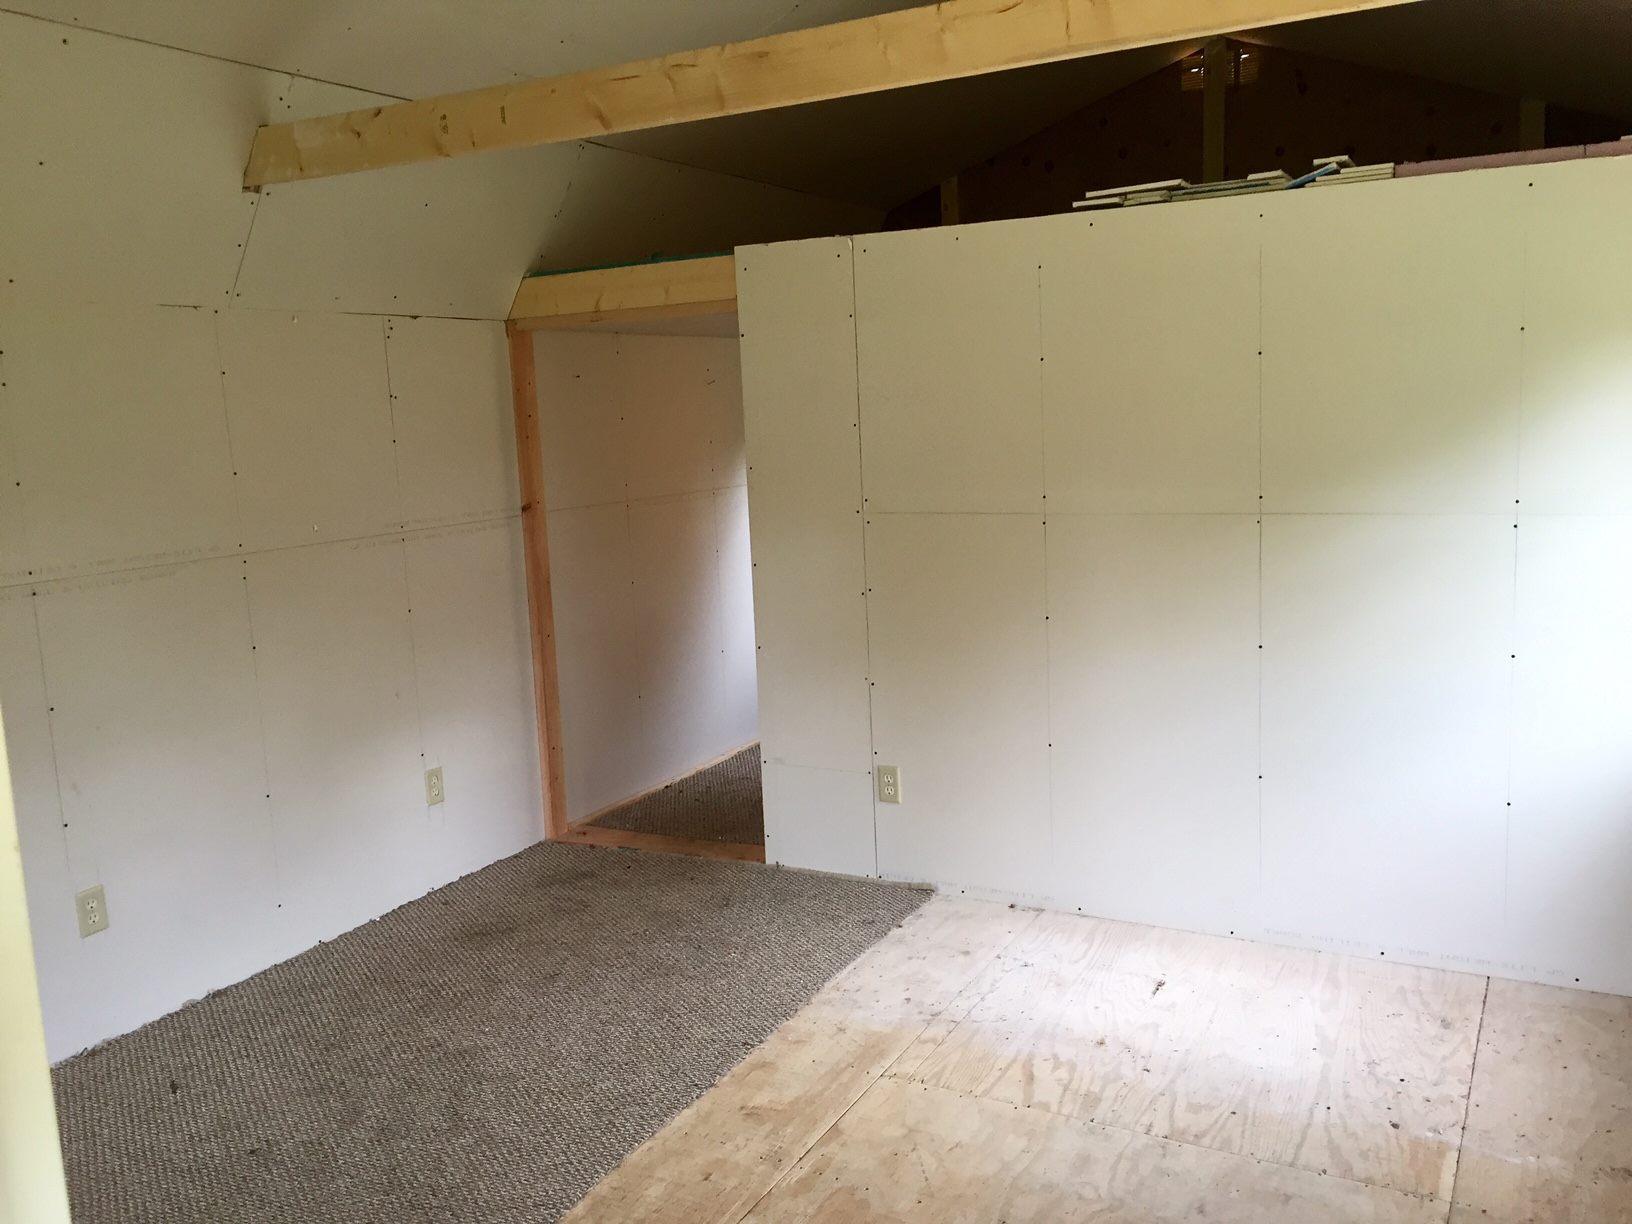 Insidebuilding2